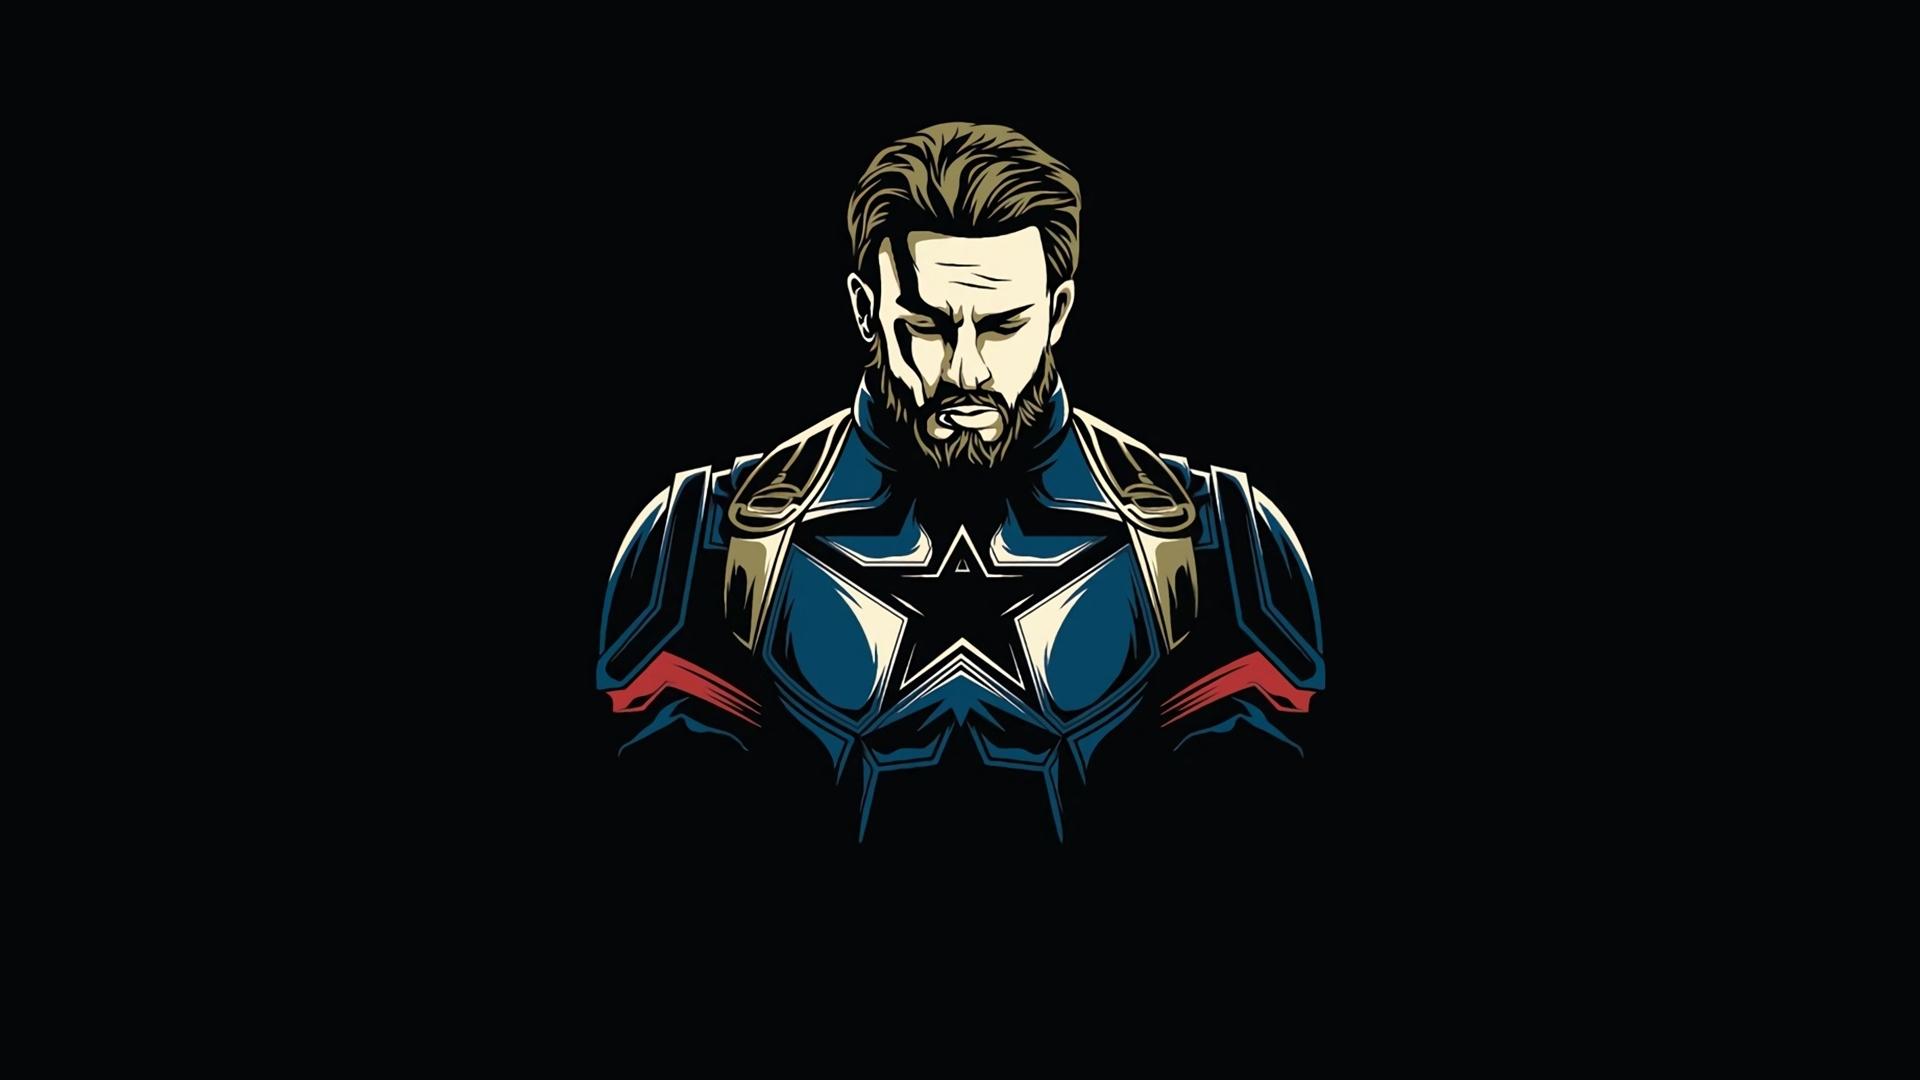 Download 1920x1080 Wallpaper First Avenger Captain America